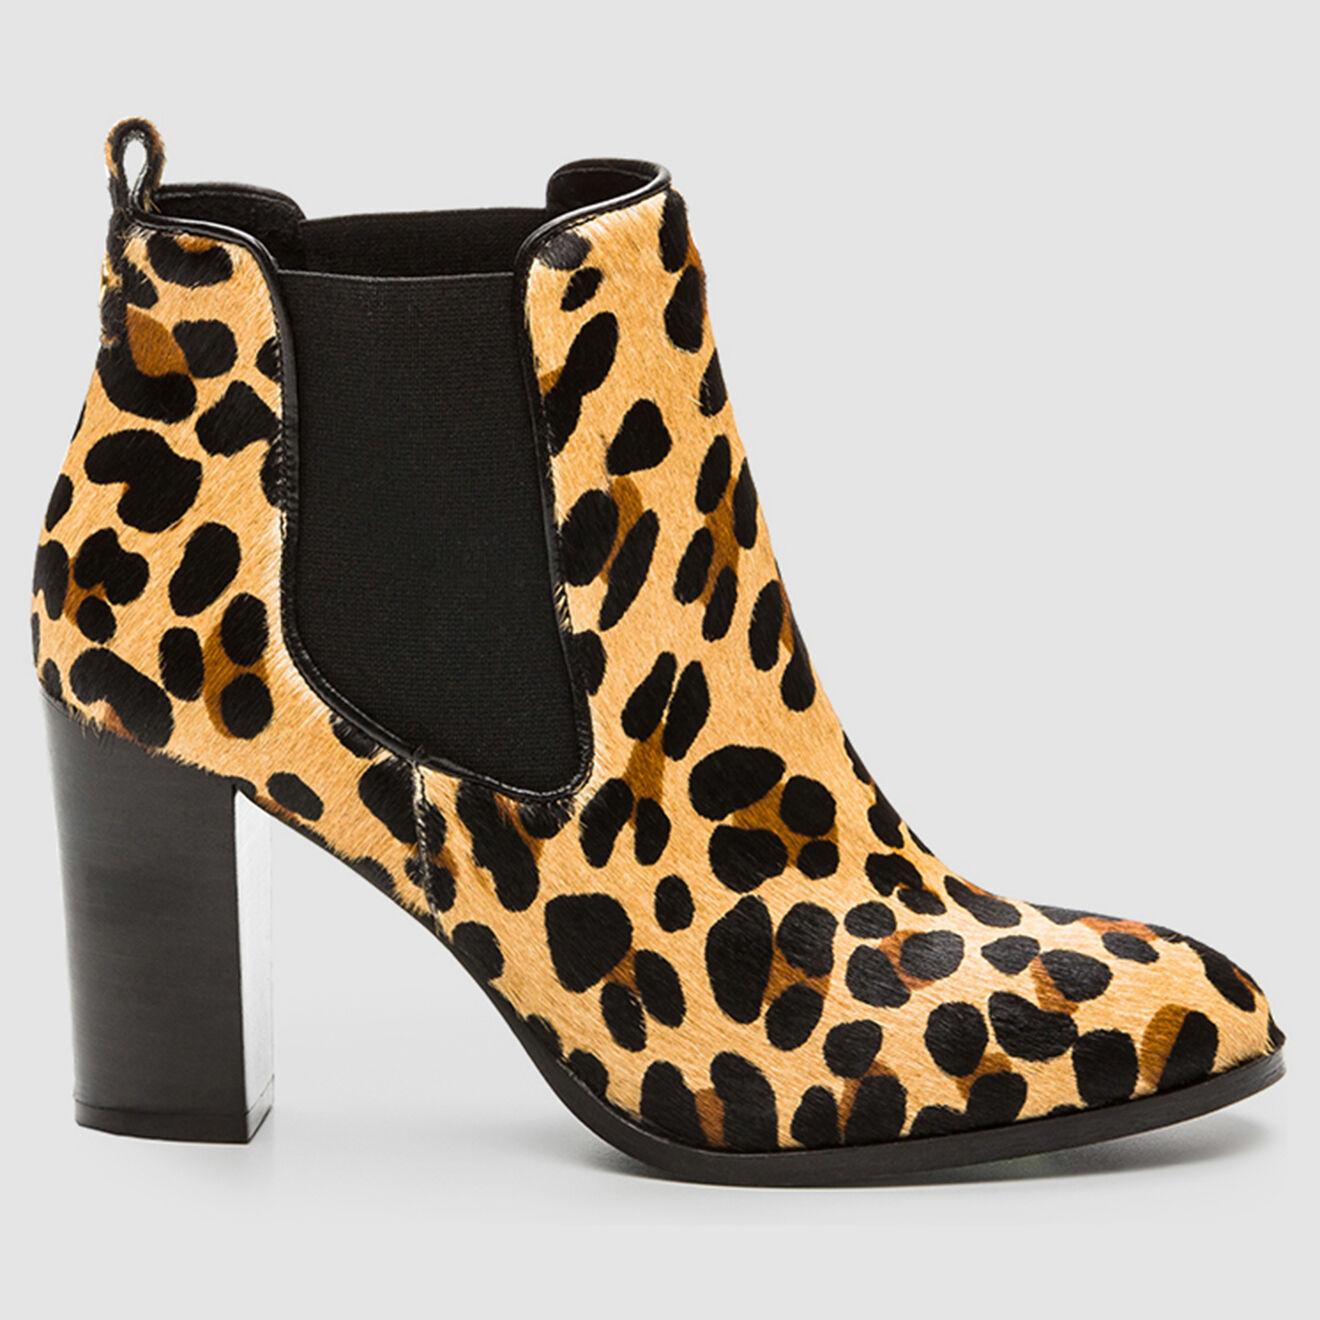 Chelsea Boots en Poulain Veleo léopard beige/marron - Talon 8 cm - Cosmoparis - Modalova